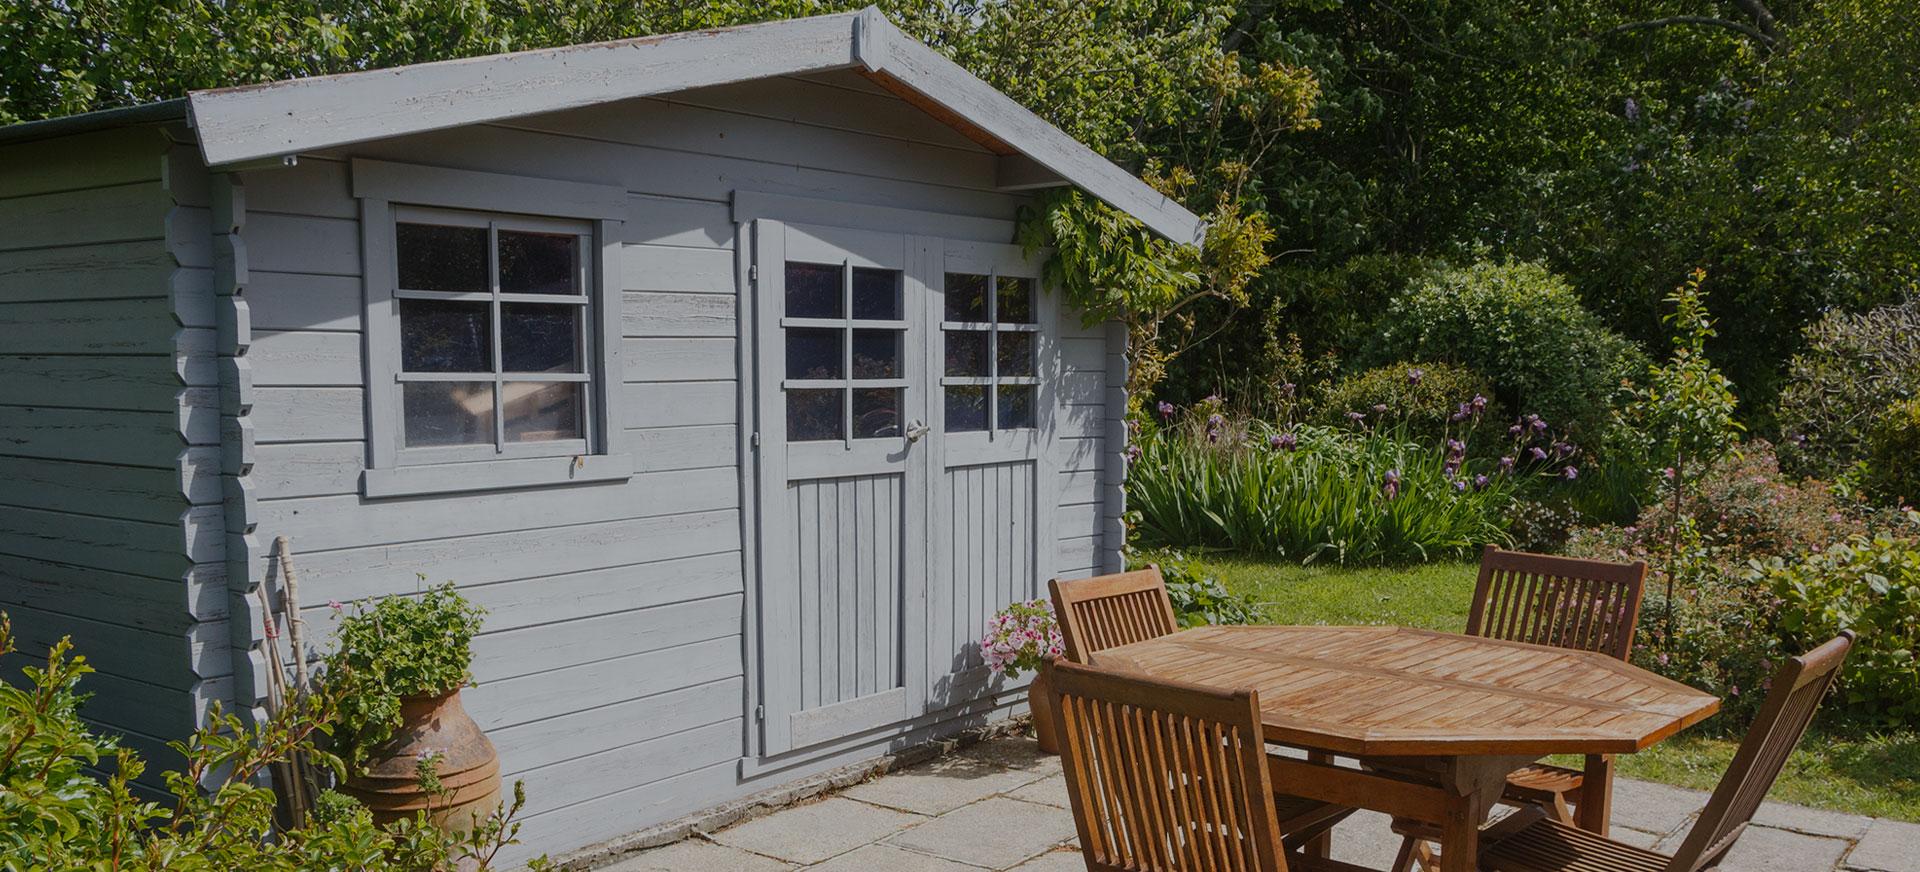 sheds_summerhouses